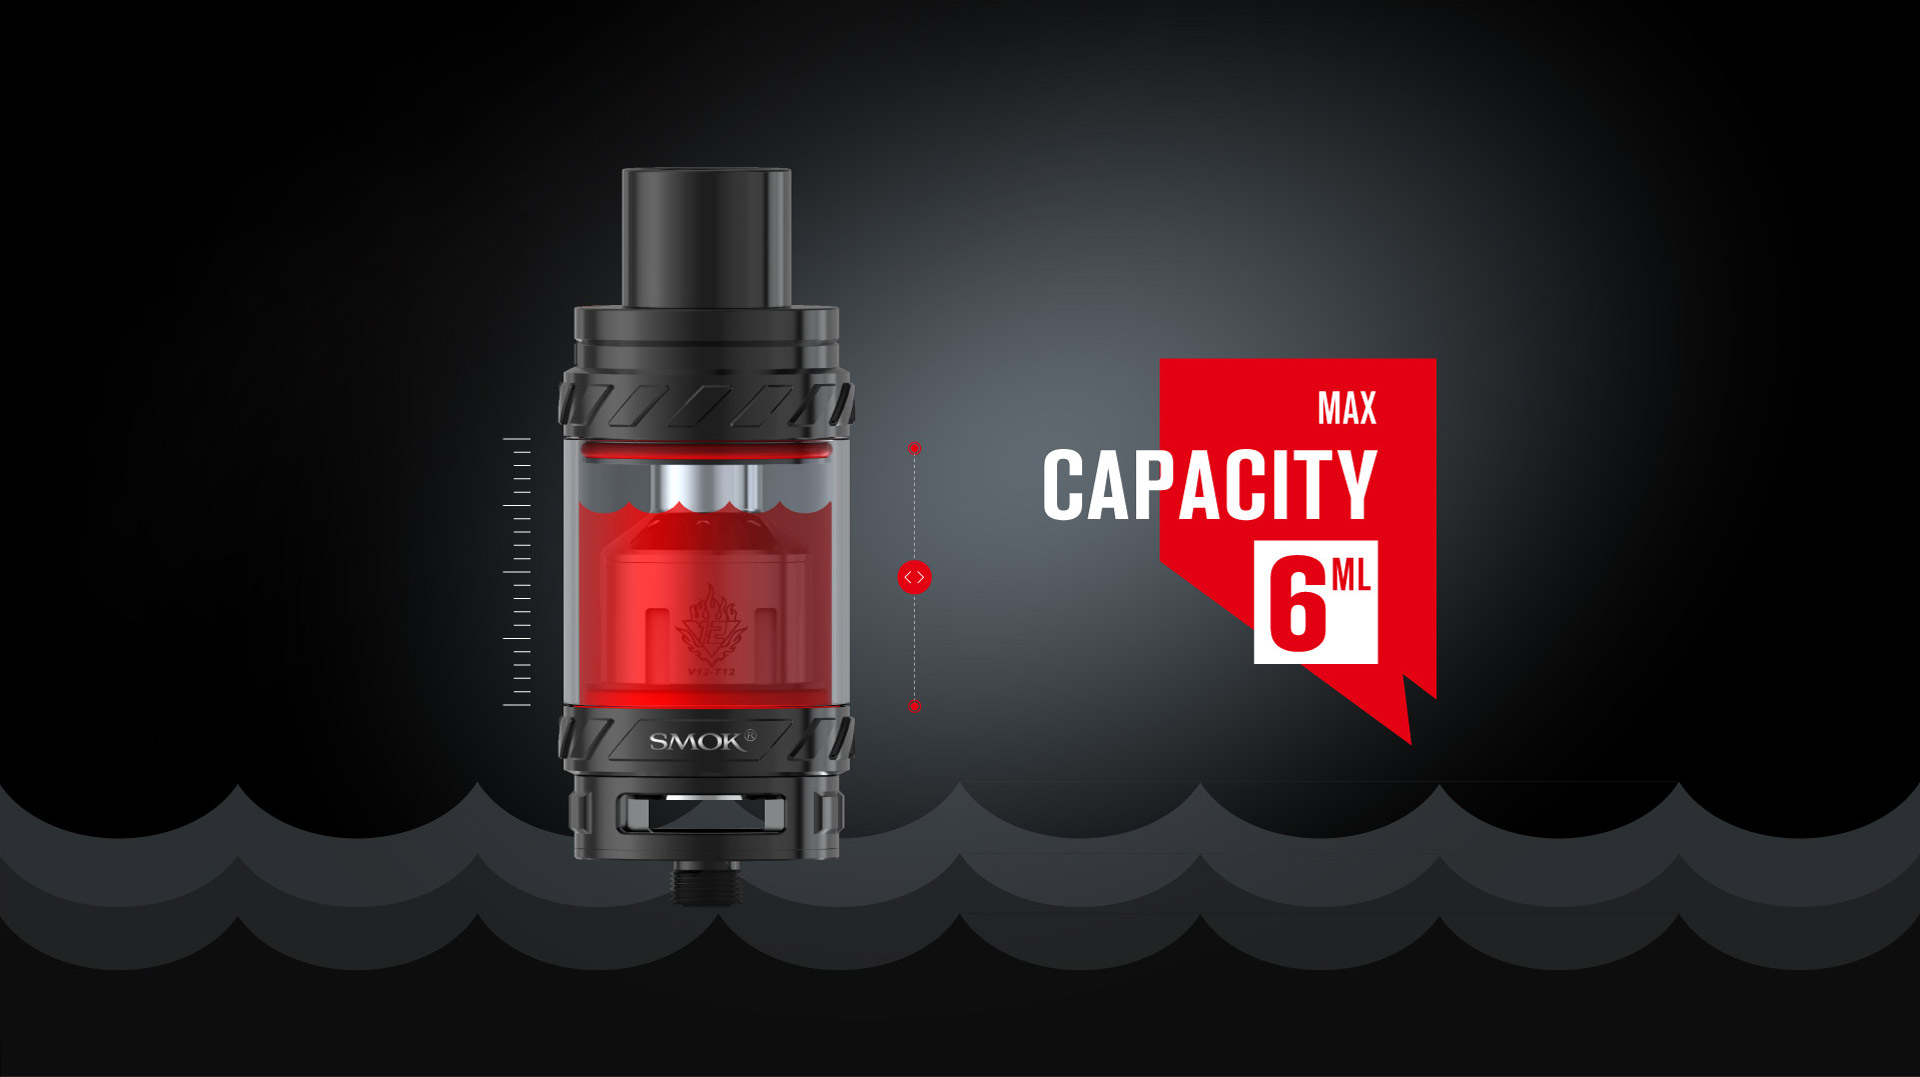 TFV12 by SMOK 6ml MAX CAPACITY